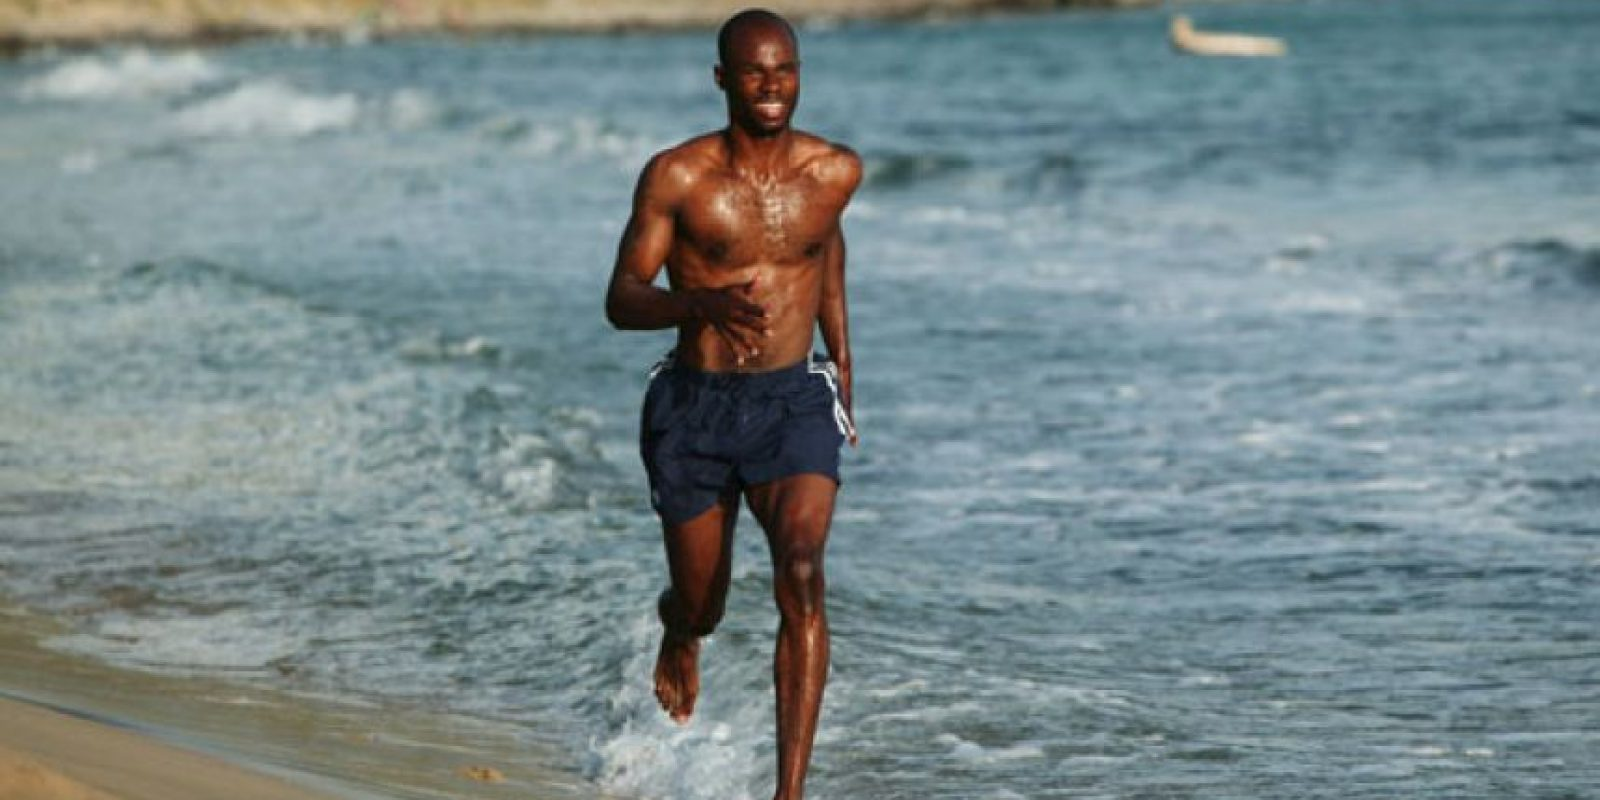 Nació en Saint Kitts and Nevis el 5 de abril de 1976. Foto:Getty Images